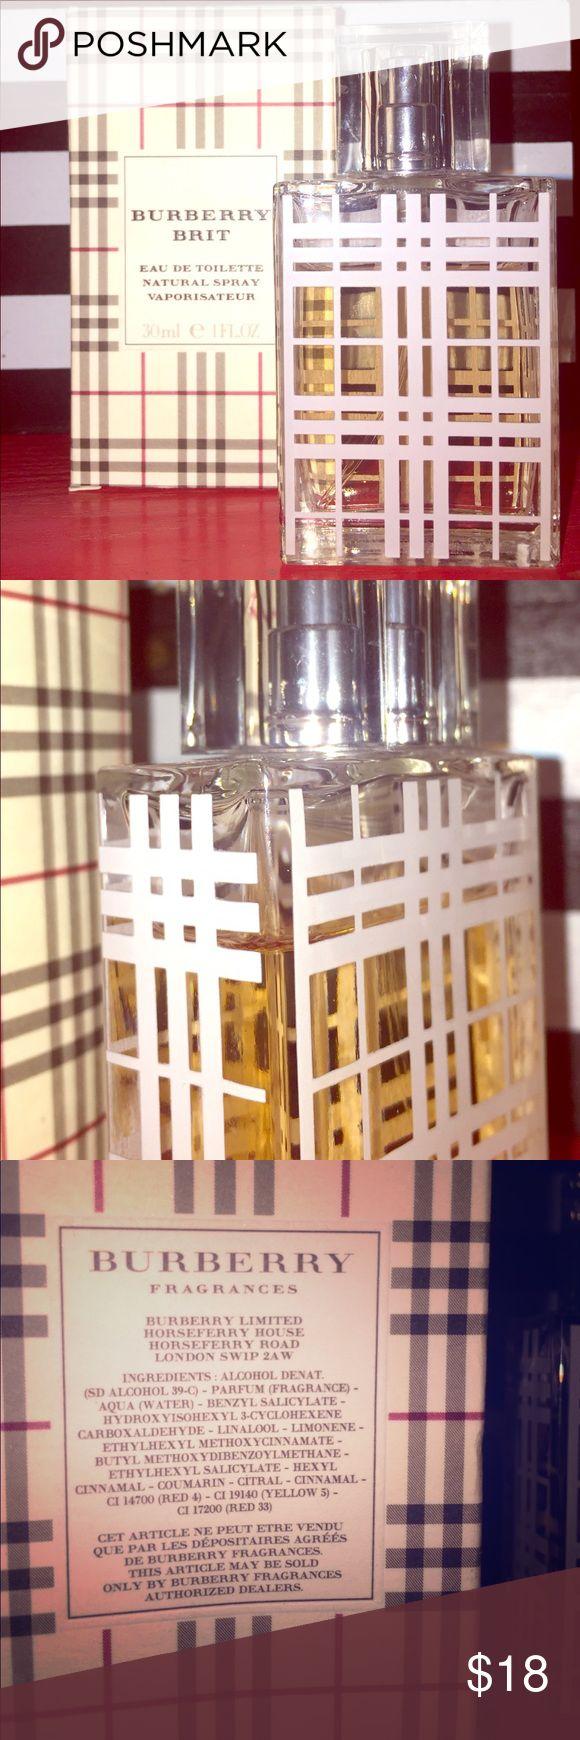 BURBERRY BRIT 30 ml Fragrance Perfume Burberry Brit fragrance with box. Used once. 30 ml Burberry Other